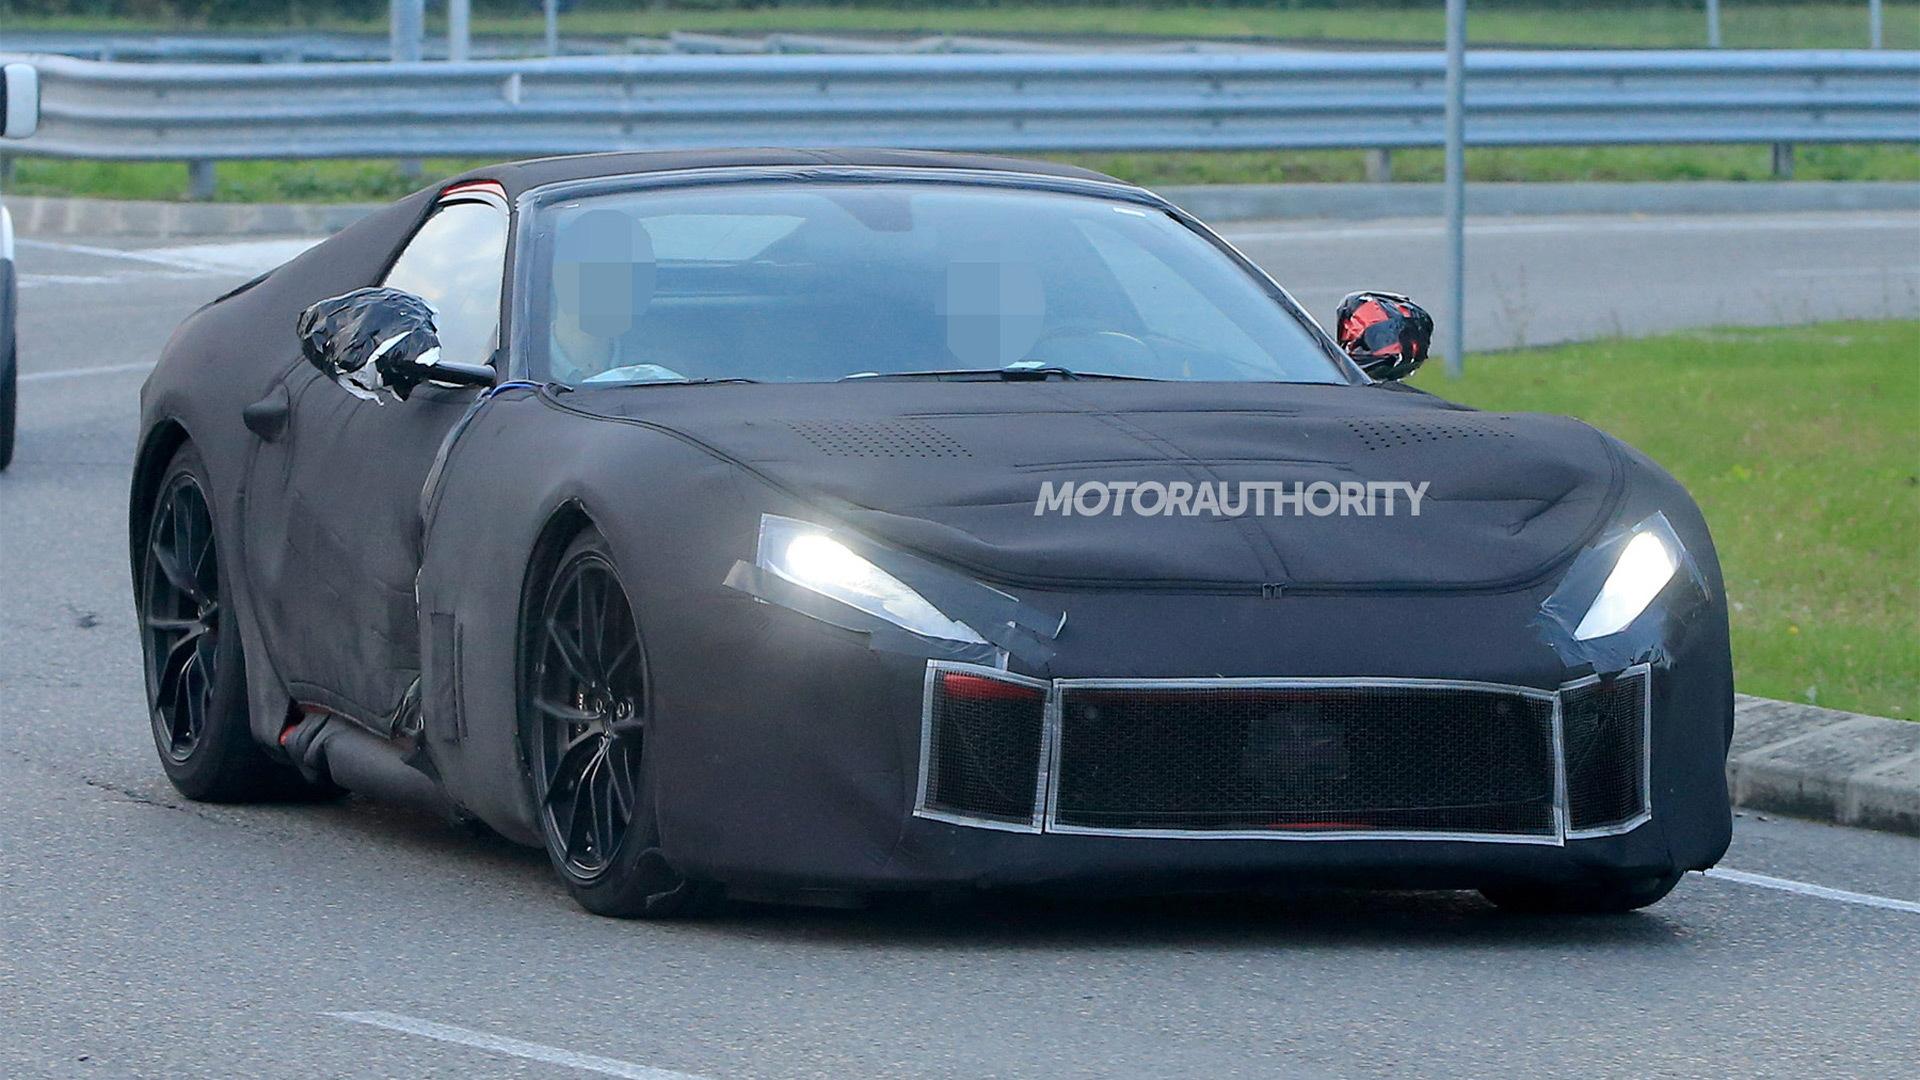 2018 Ferrari F12 M spy shots - Image via S. Baldauf/SB-Medien